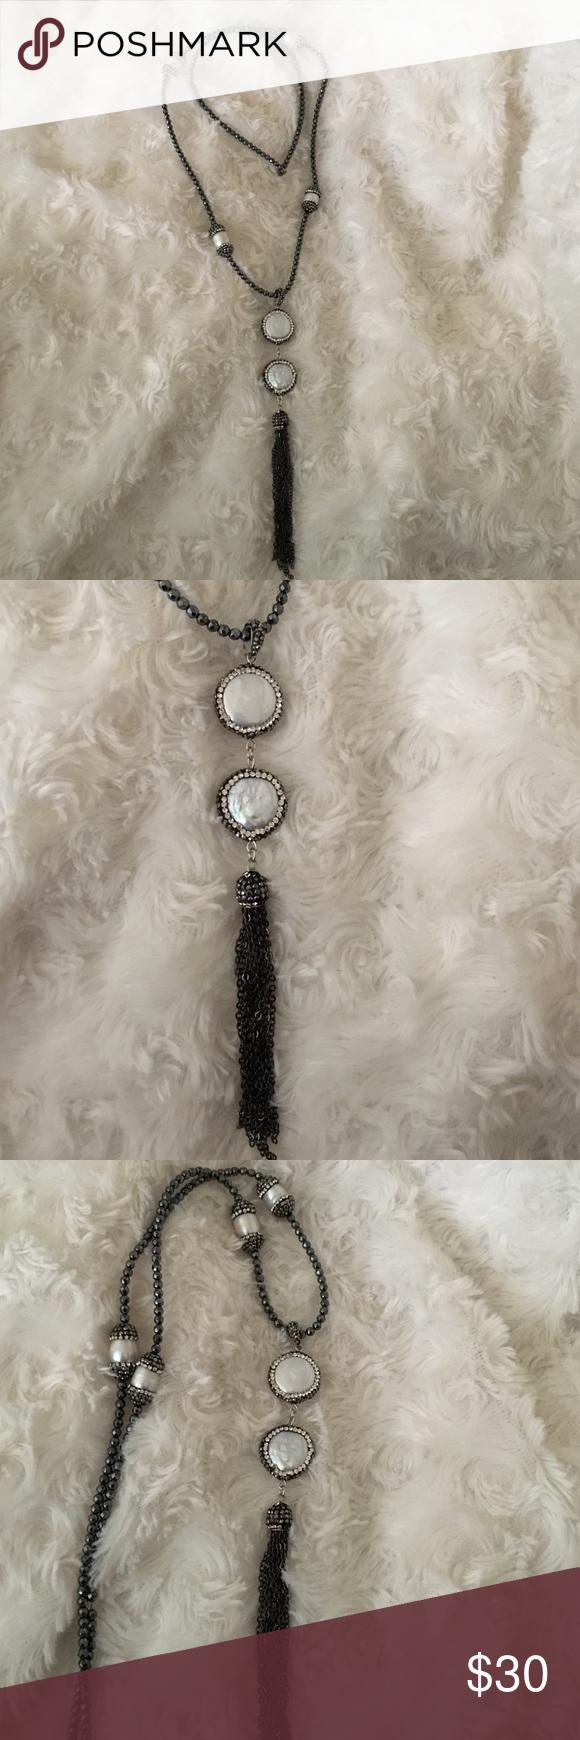 Vintage pearl CZ druzy Necklace with Tassel round & cylinder pearl CZ druzy Necklace with Tassel vintage necklace Jewelry Necklaces